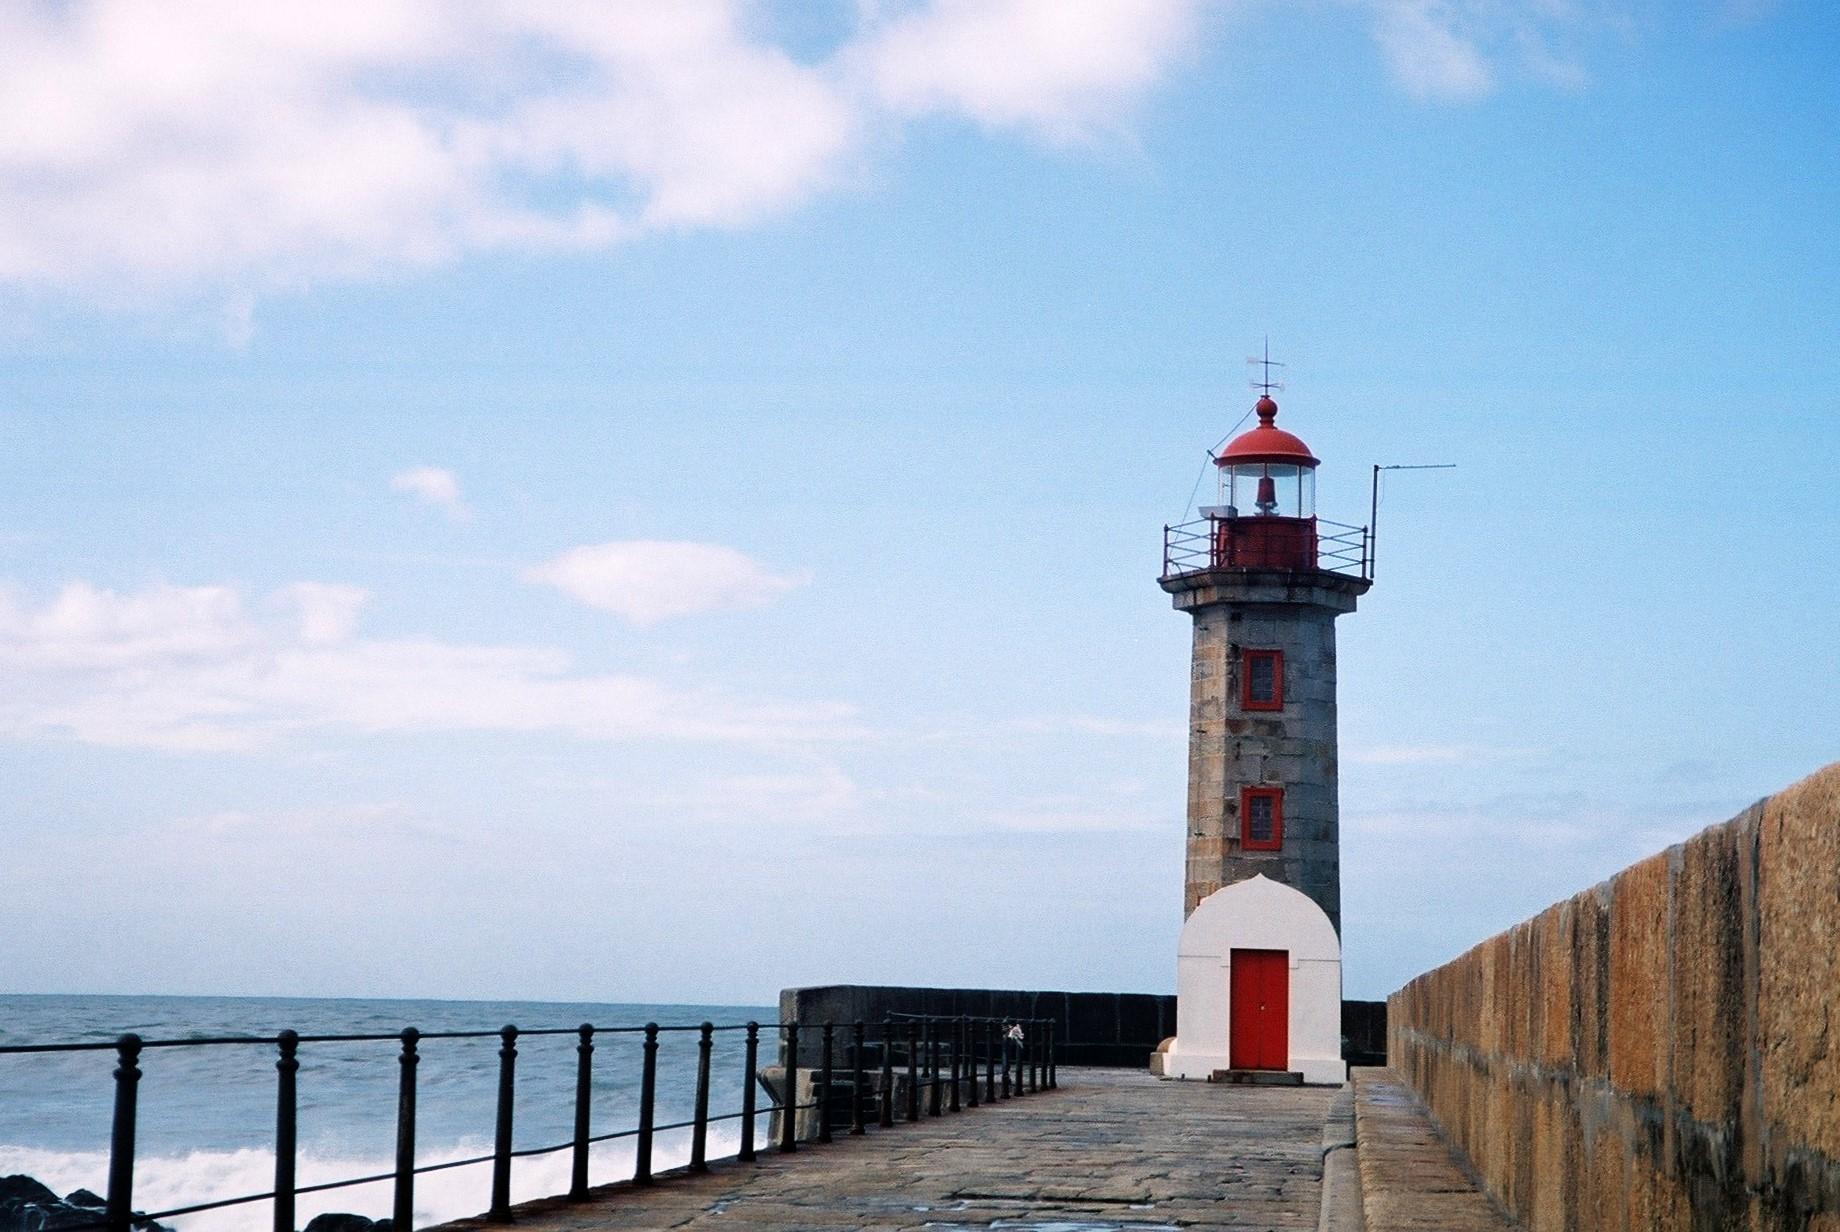 File:Felgueiras Lighthouse and Pier 2.JPG - Wikimedia Commons